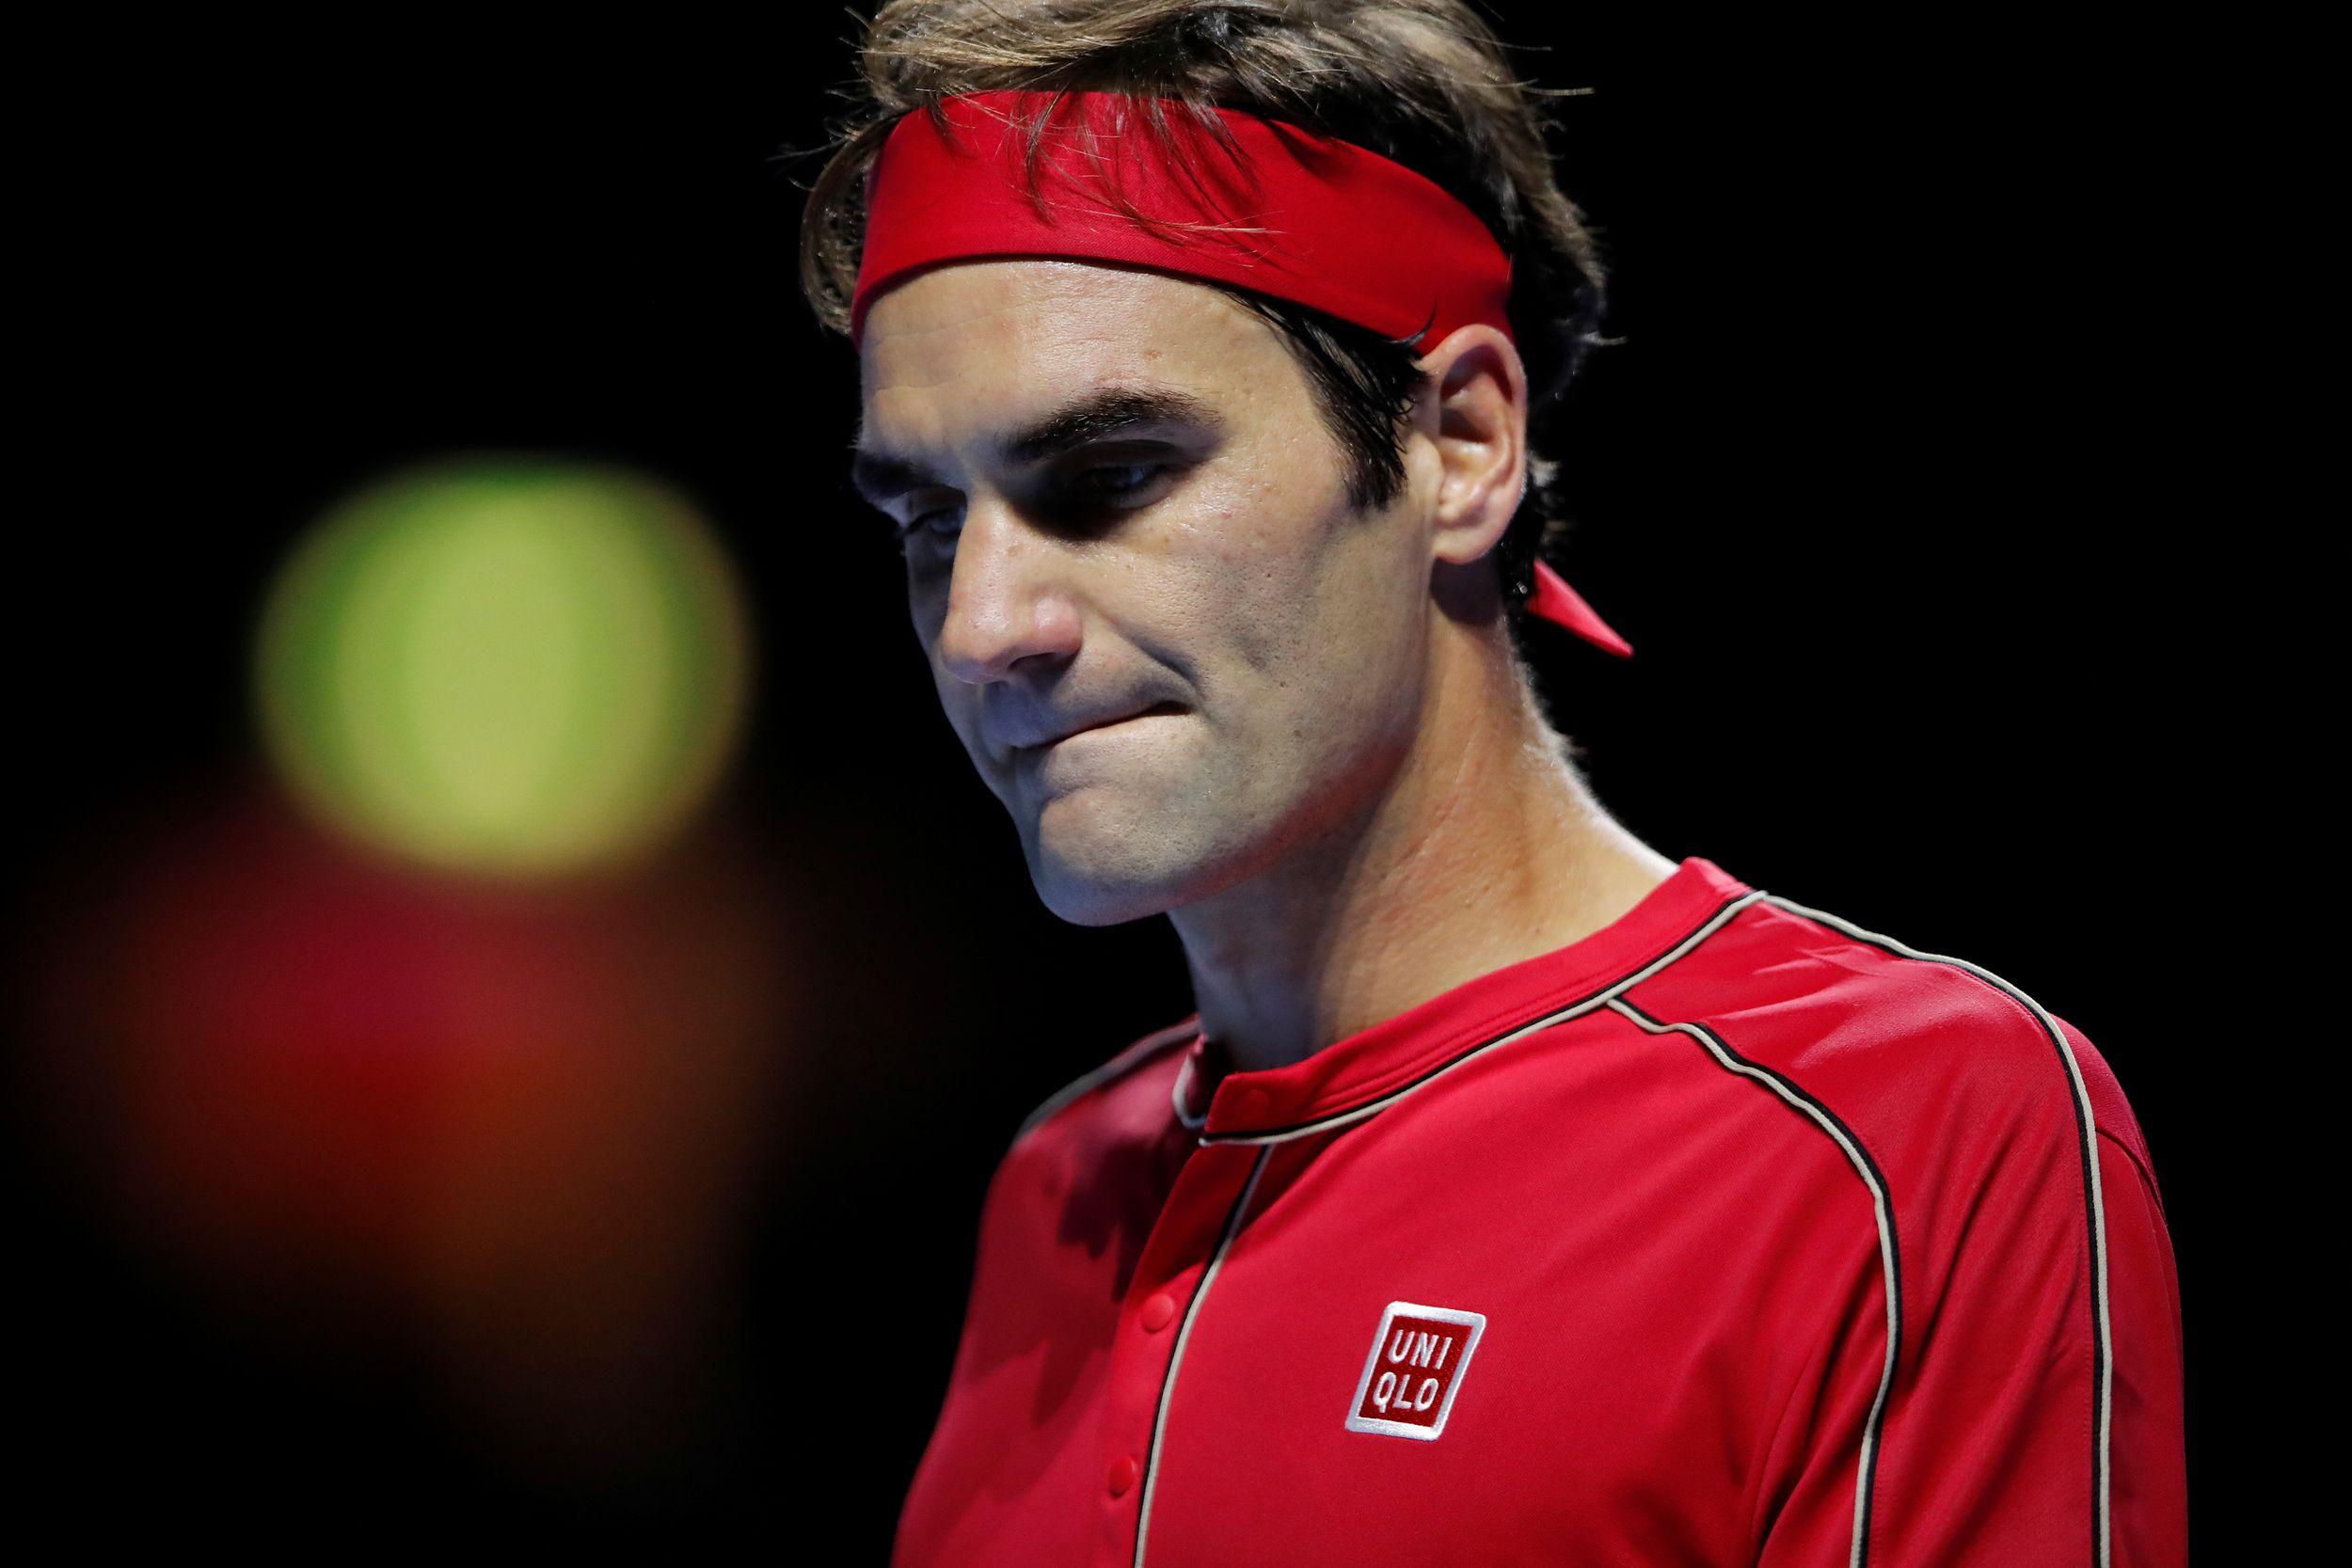 Tennis - ATP - Roger Federer renonce au Masters 1000 parisien